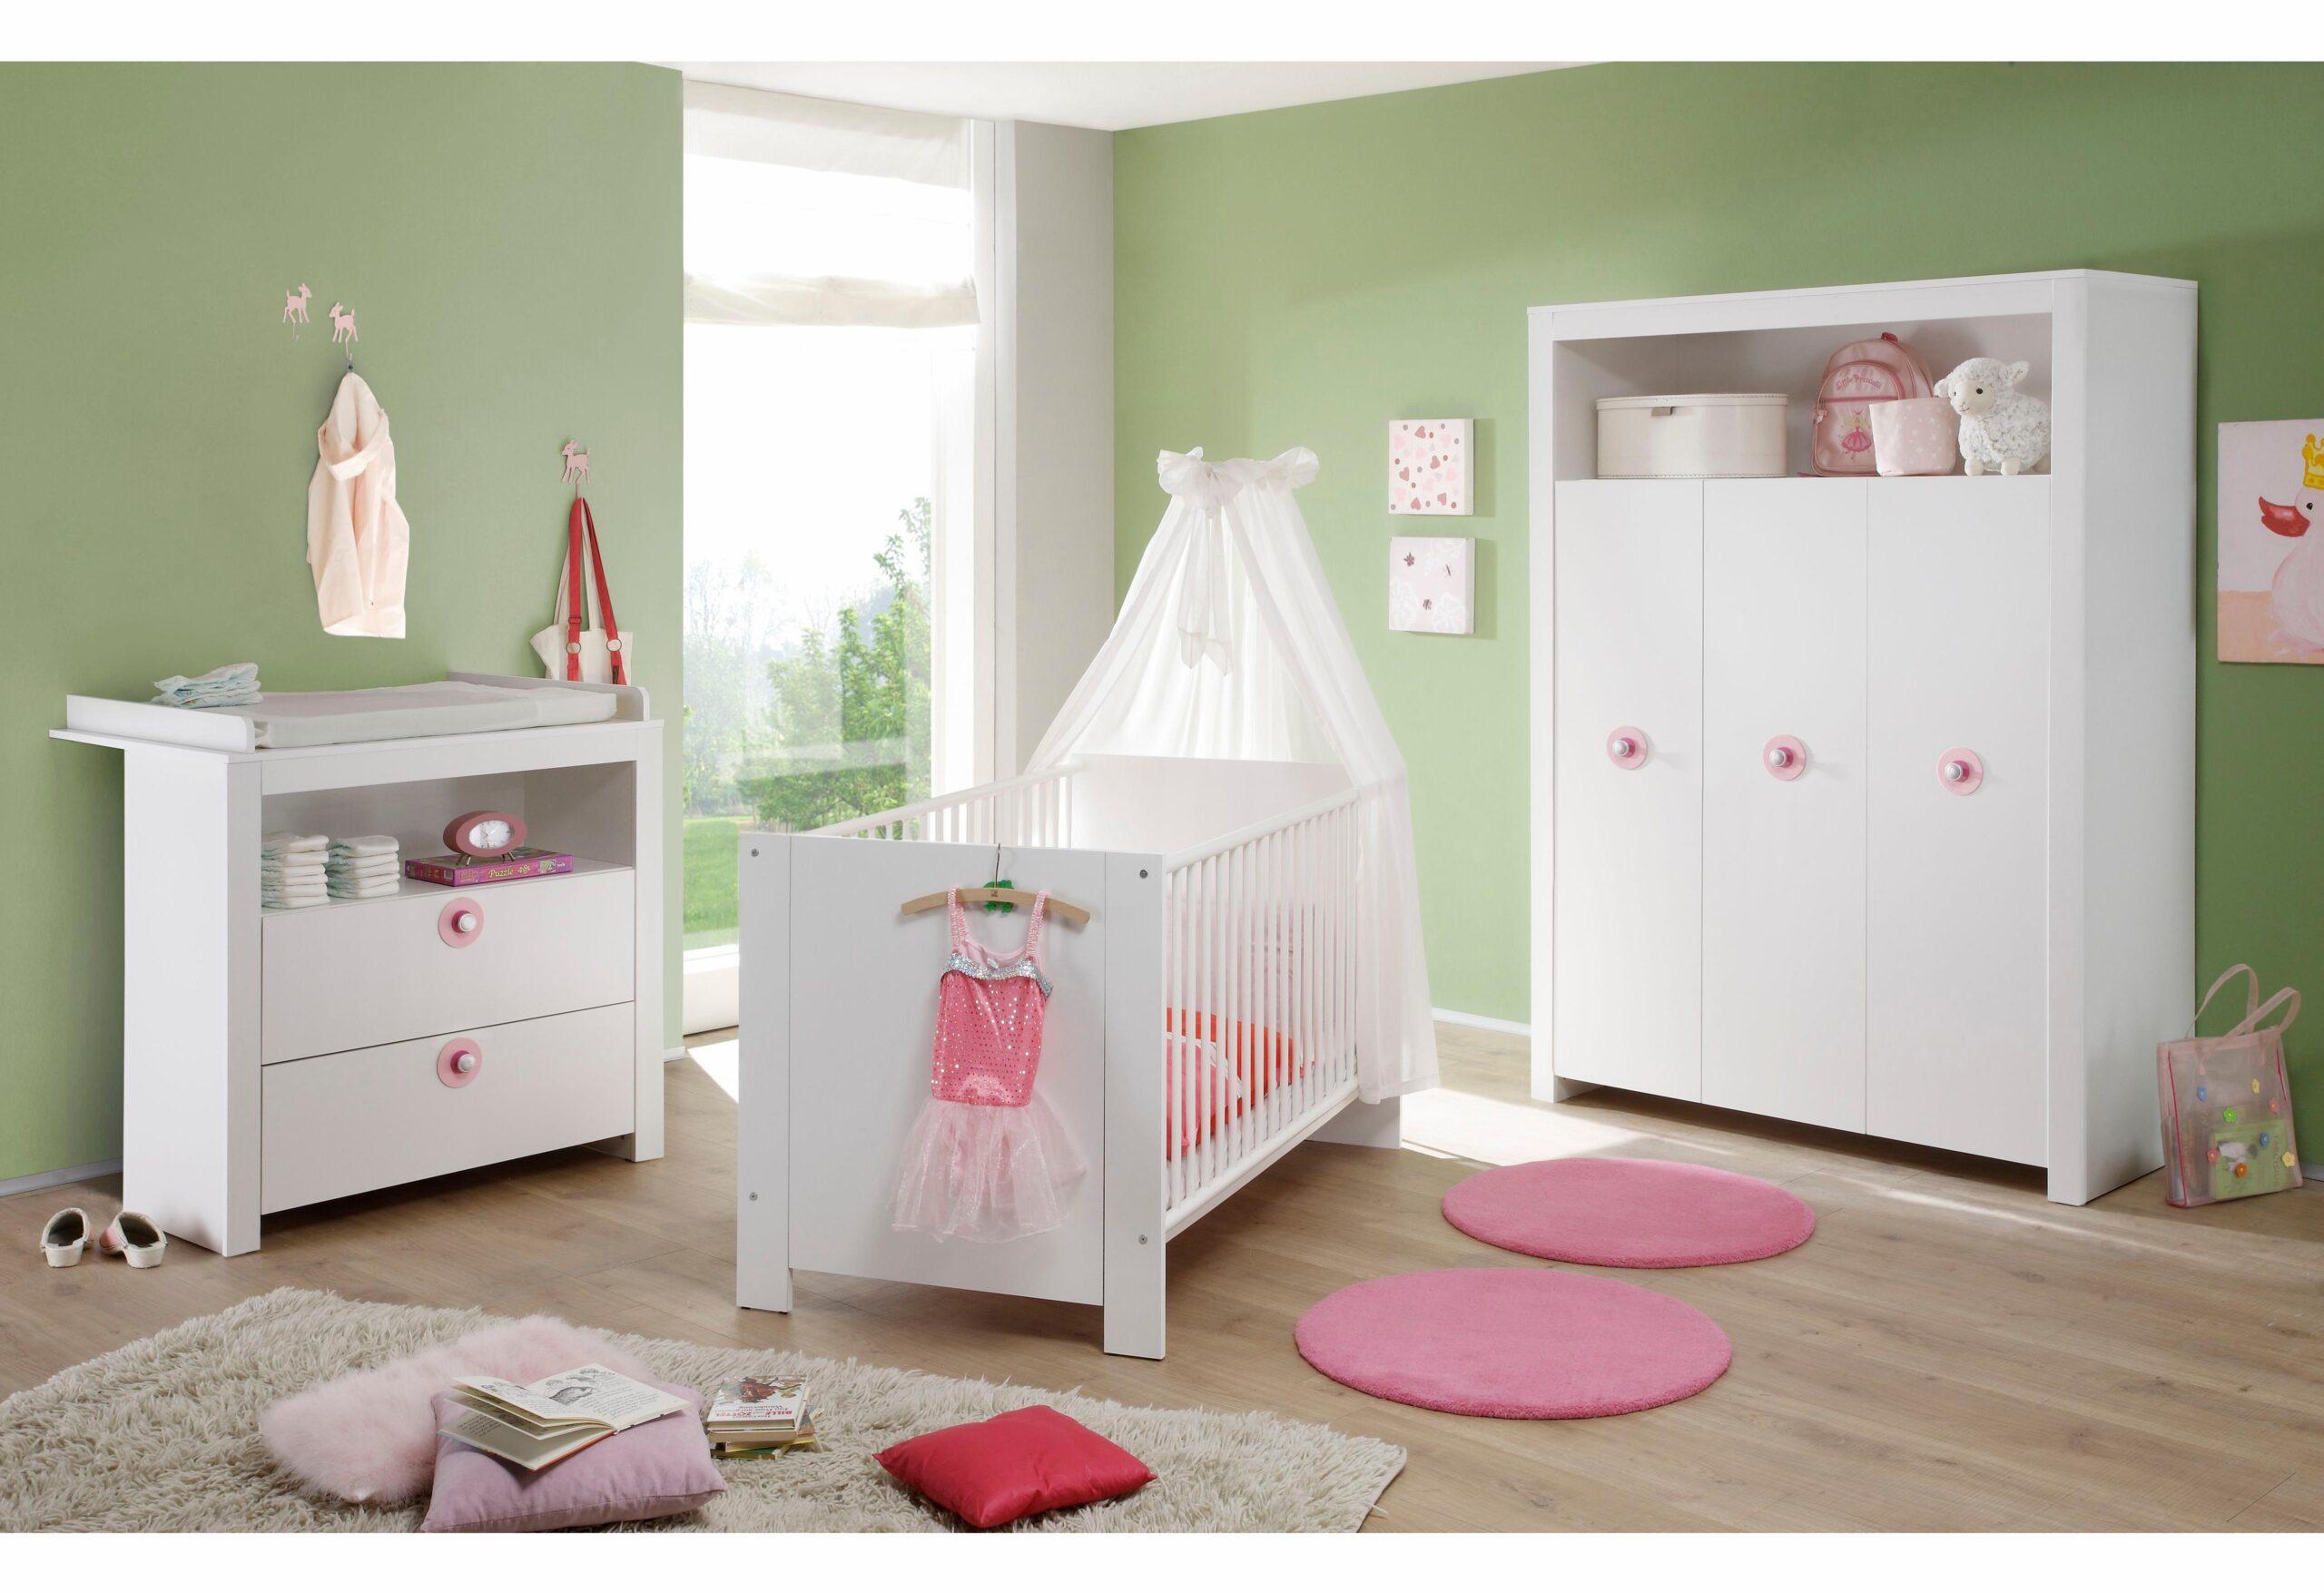 Full Size of Baby Kinderzimmer Komplett Babyzimmer Komplettset Trend Set Sofa Schlafzimmer Günstig Bad Regal Komplettangebote Bett 160x200 Günstige Mit Lattenrost Und Kinderzimmer Baby Kinderzimmer Komplett